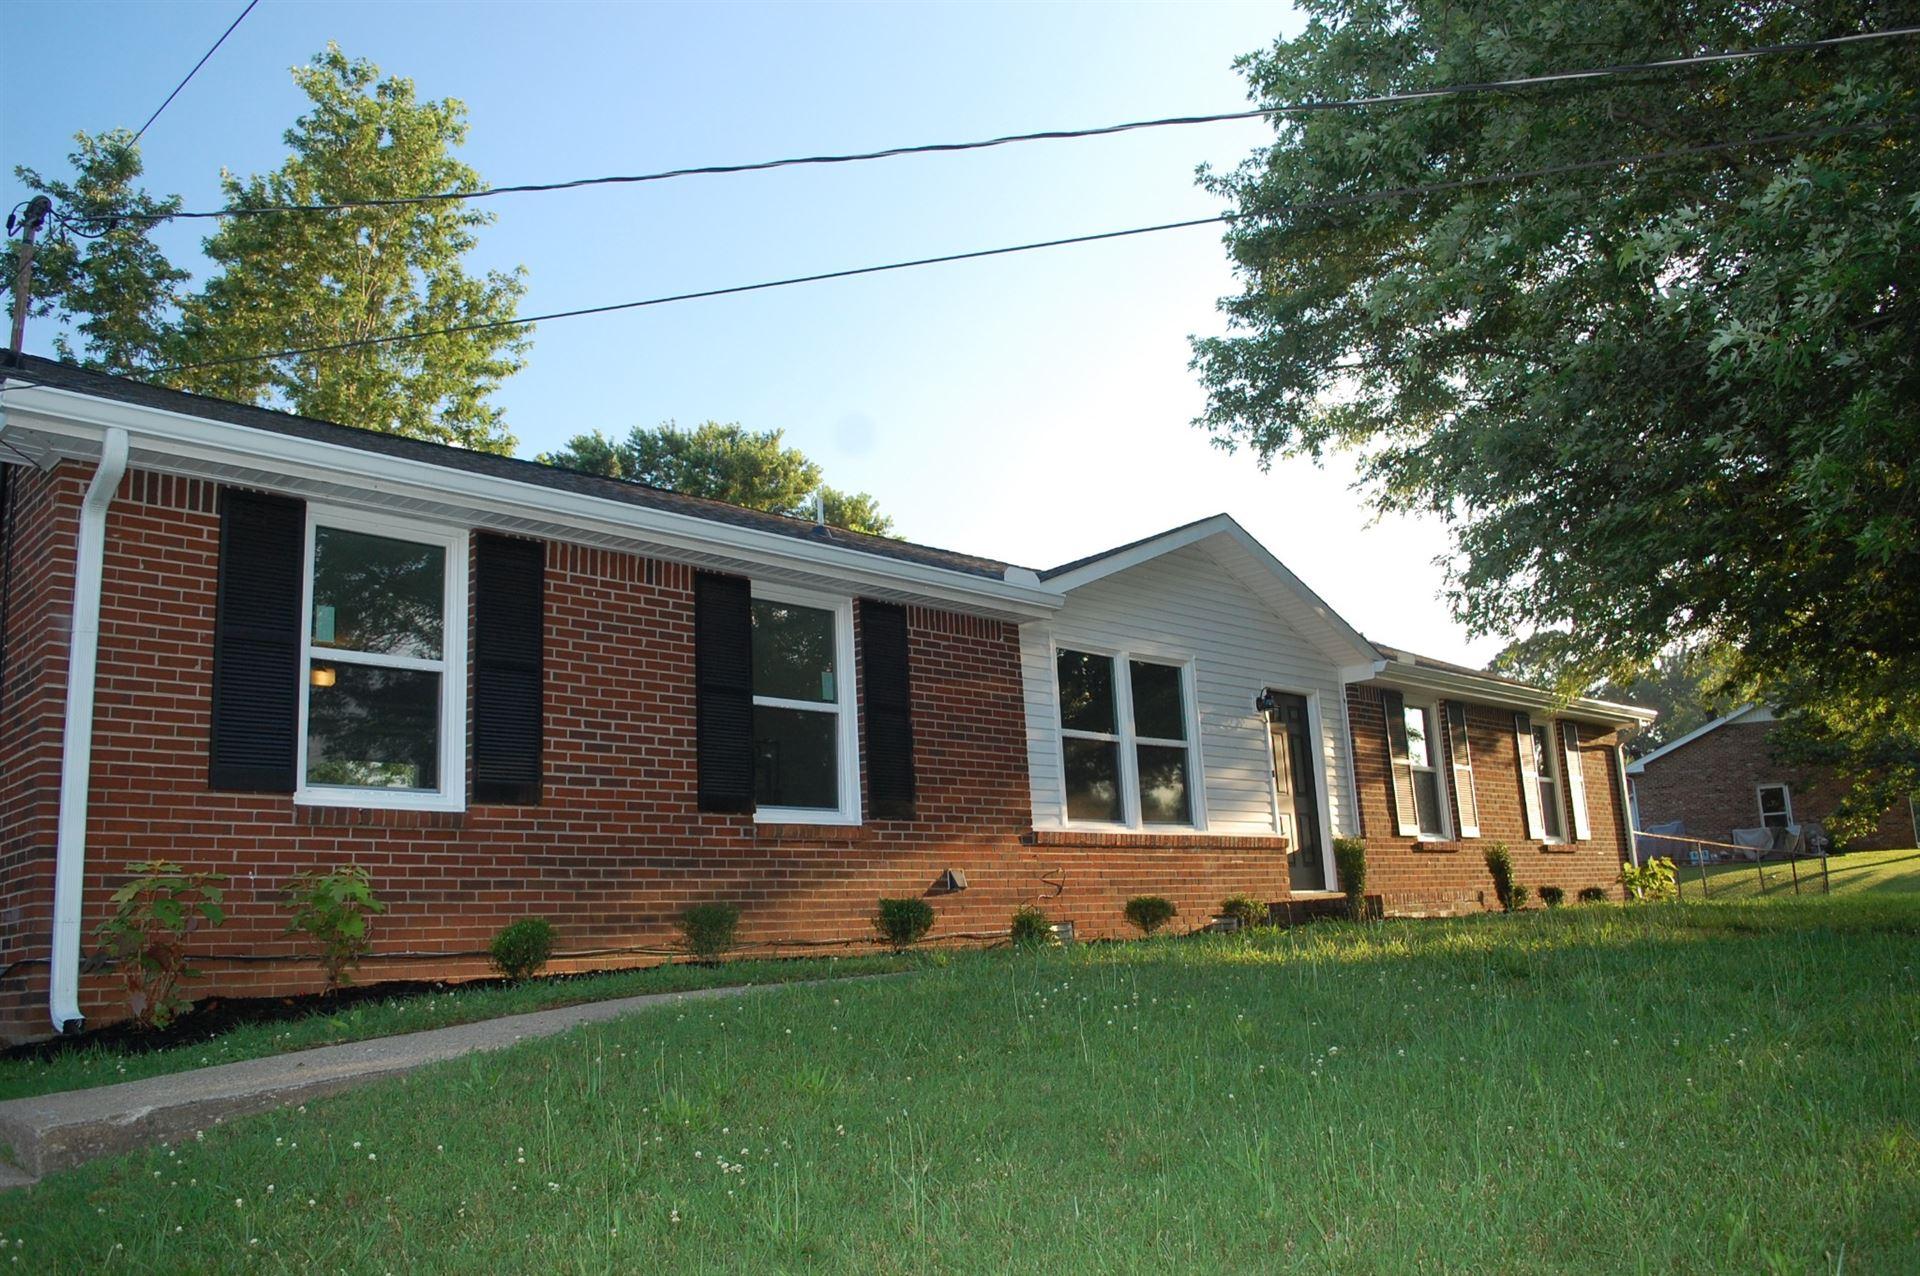 230 Raintree Dr, Clarksville, TN 37042 - MLS#: 2259813